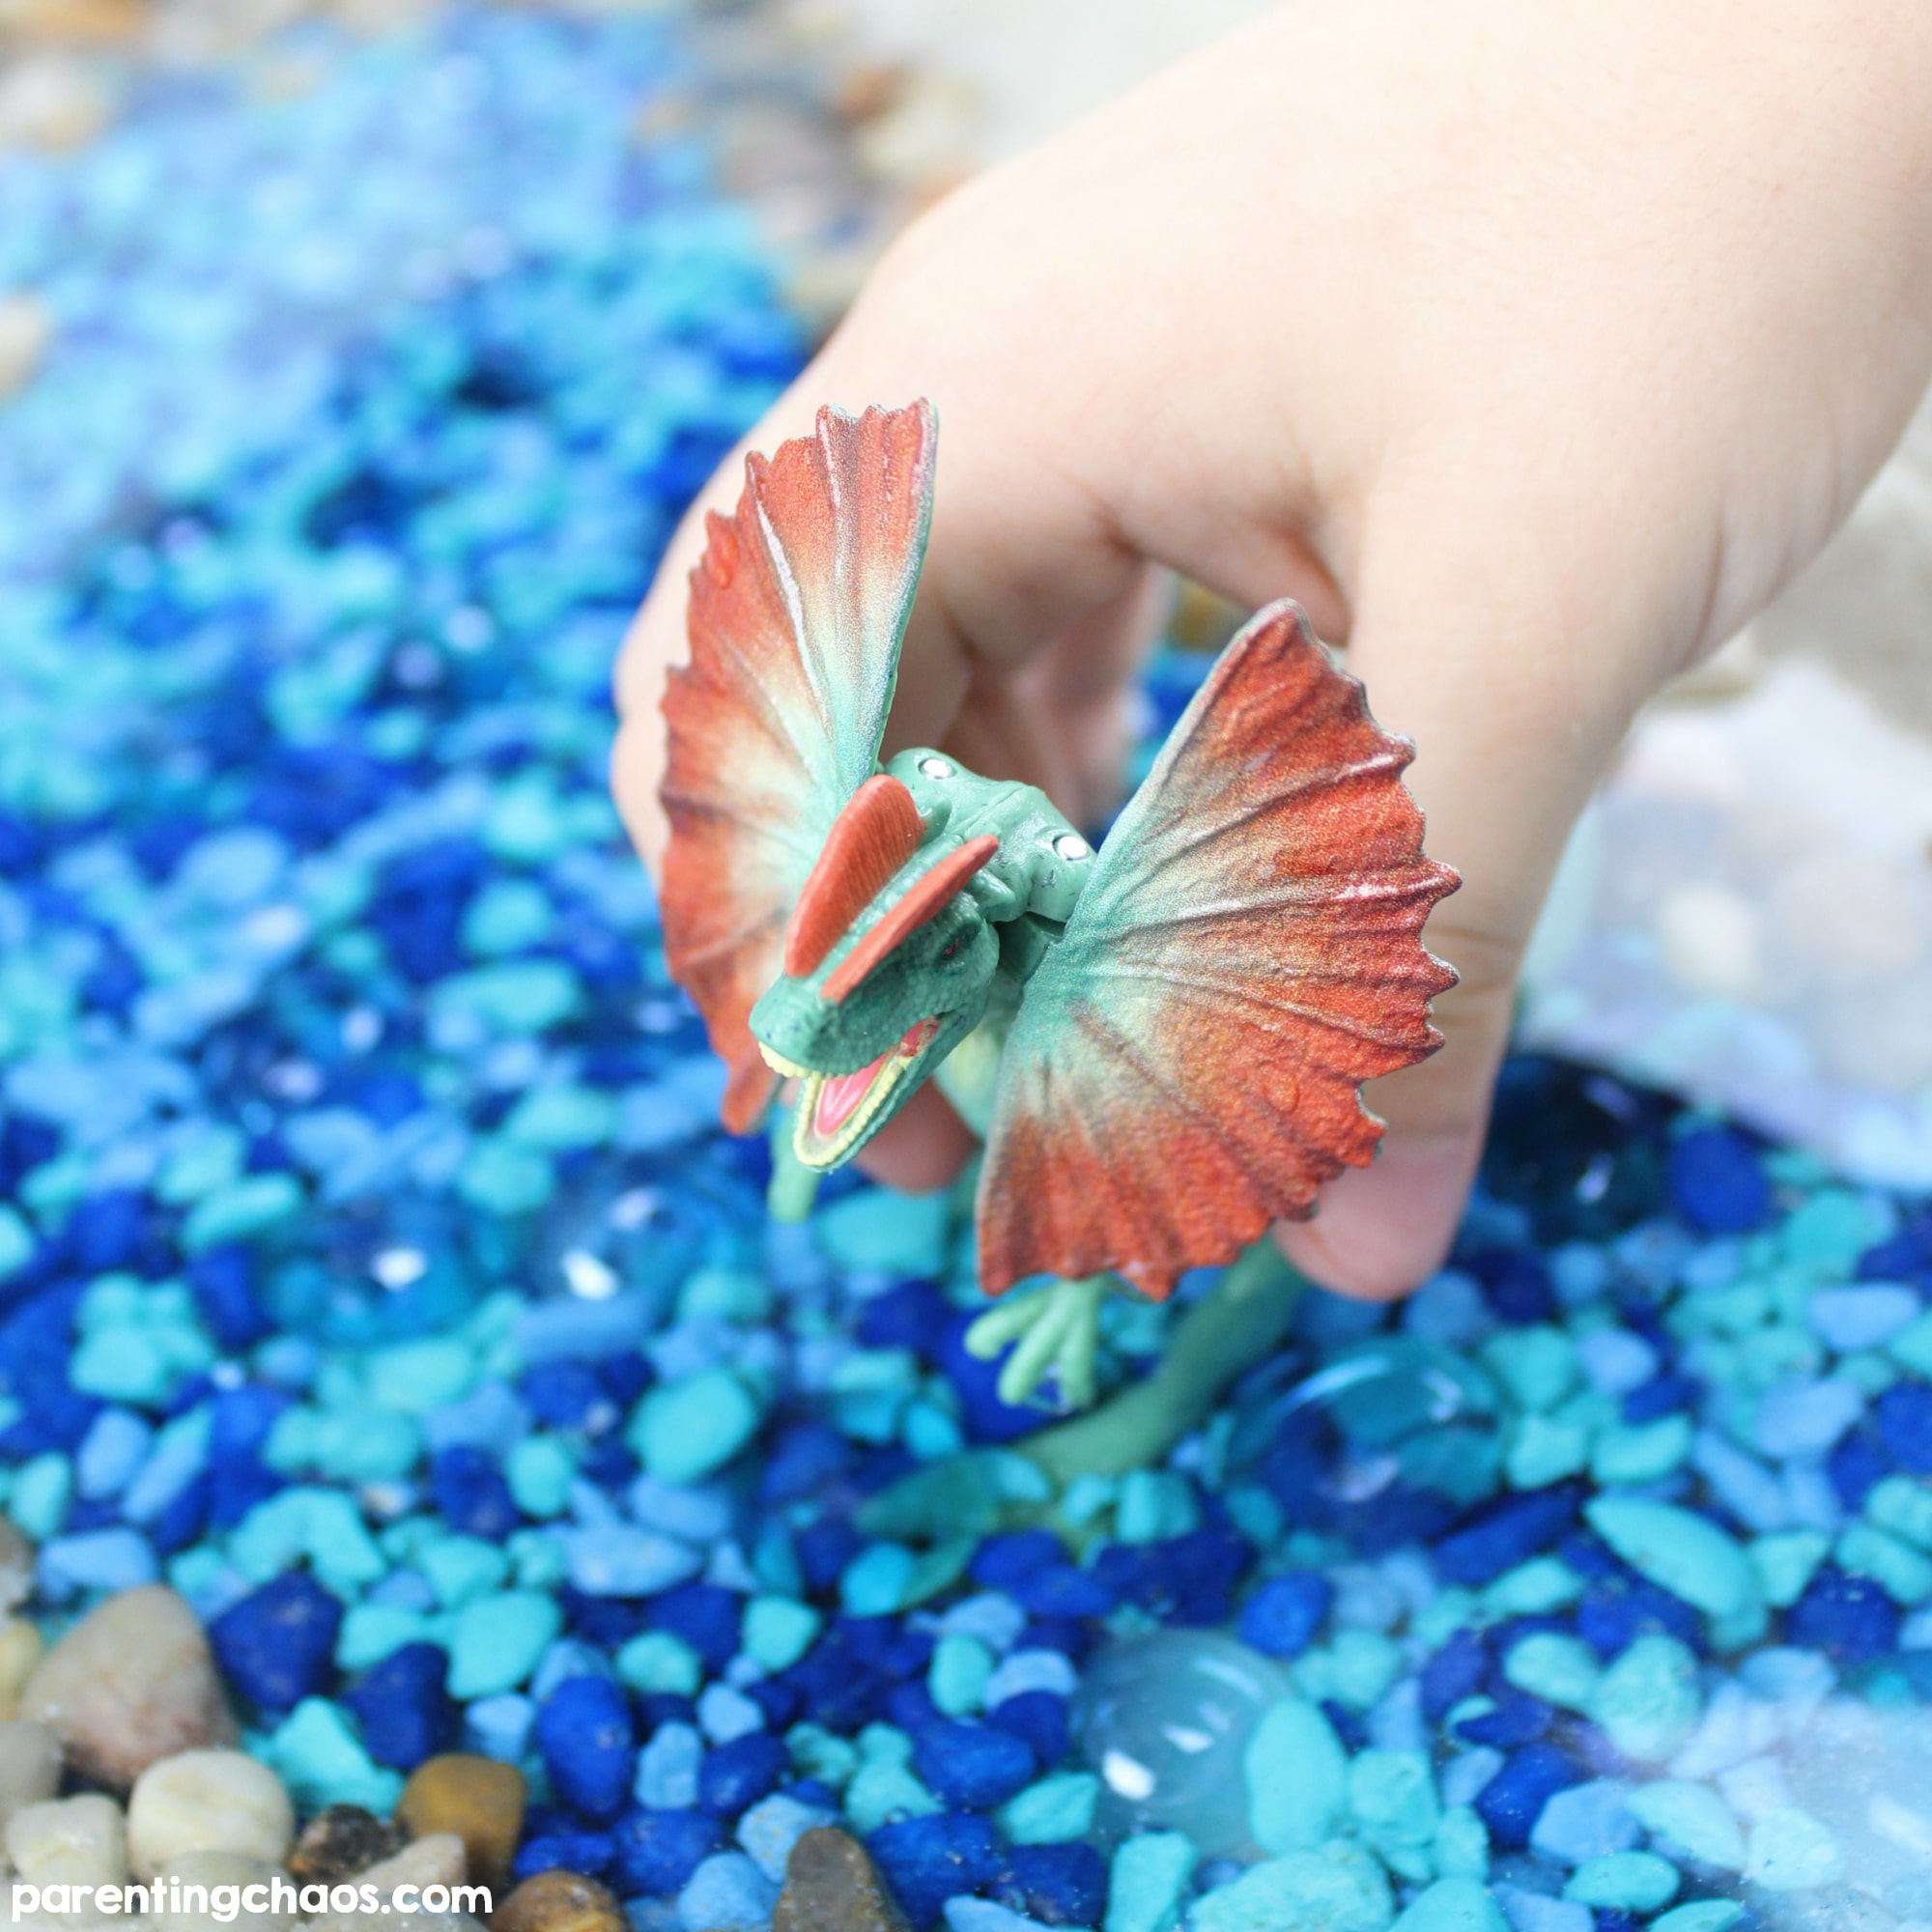 Dinosaur Small World Imaginative Play for Kids